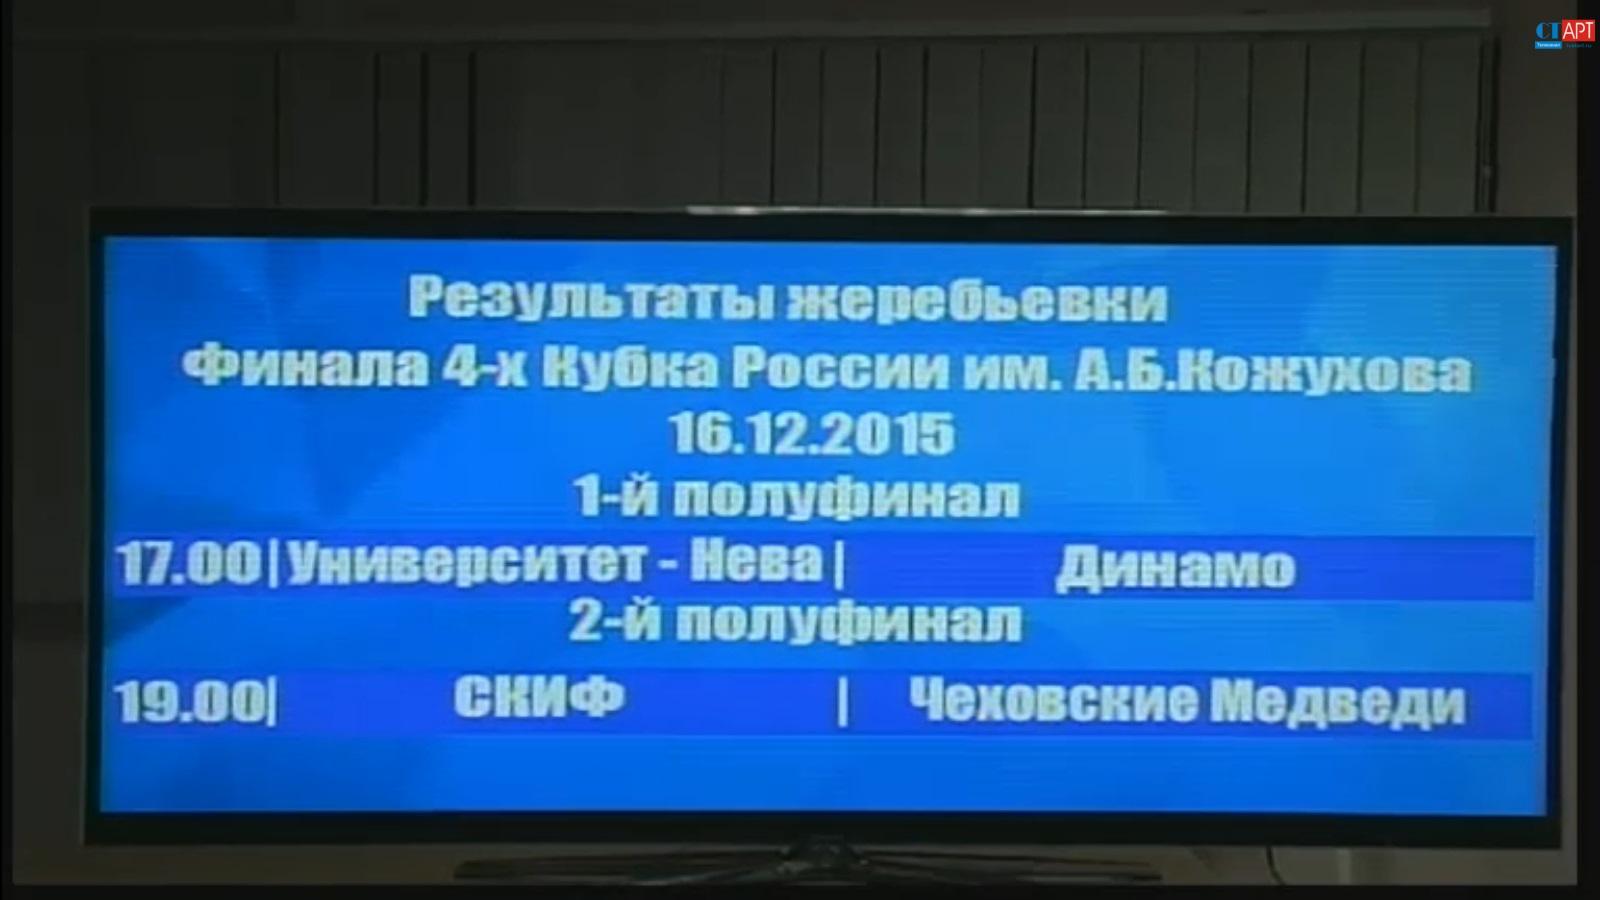 КубокРоссии